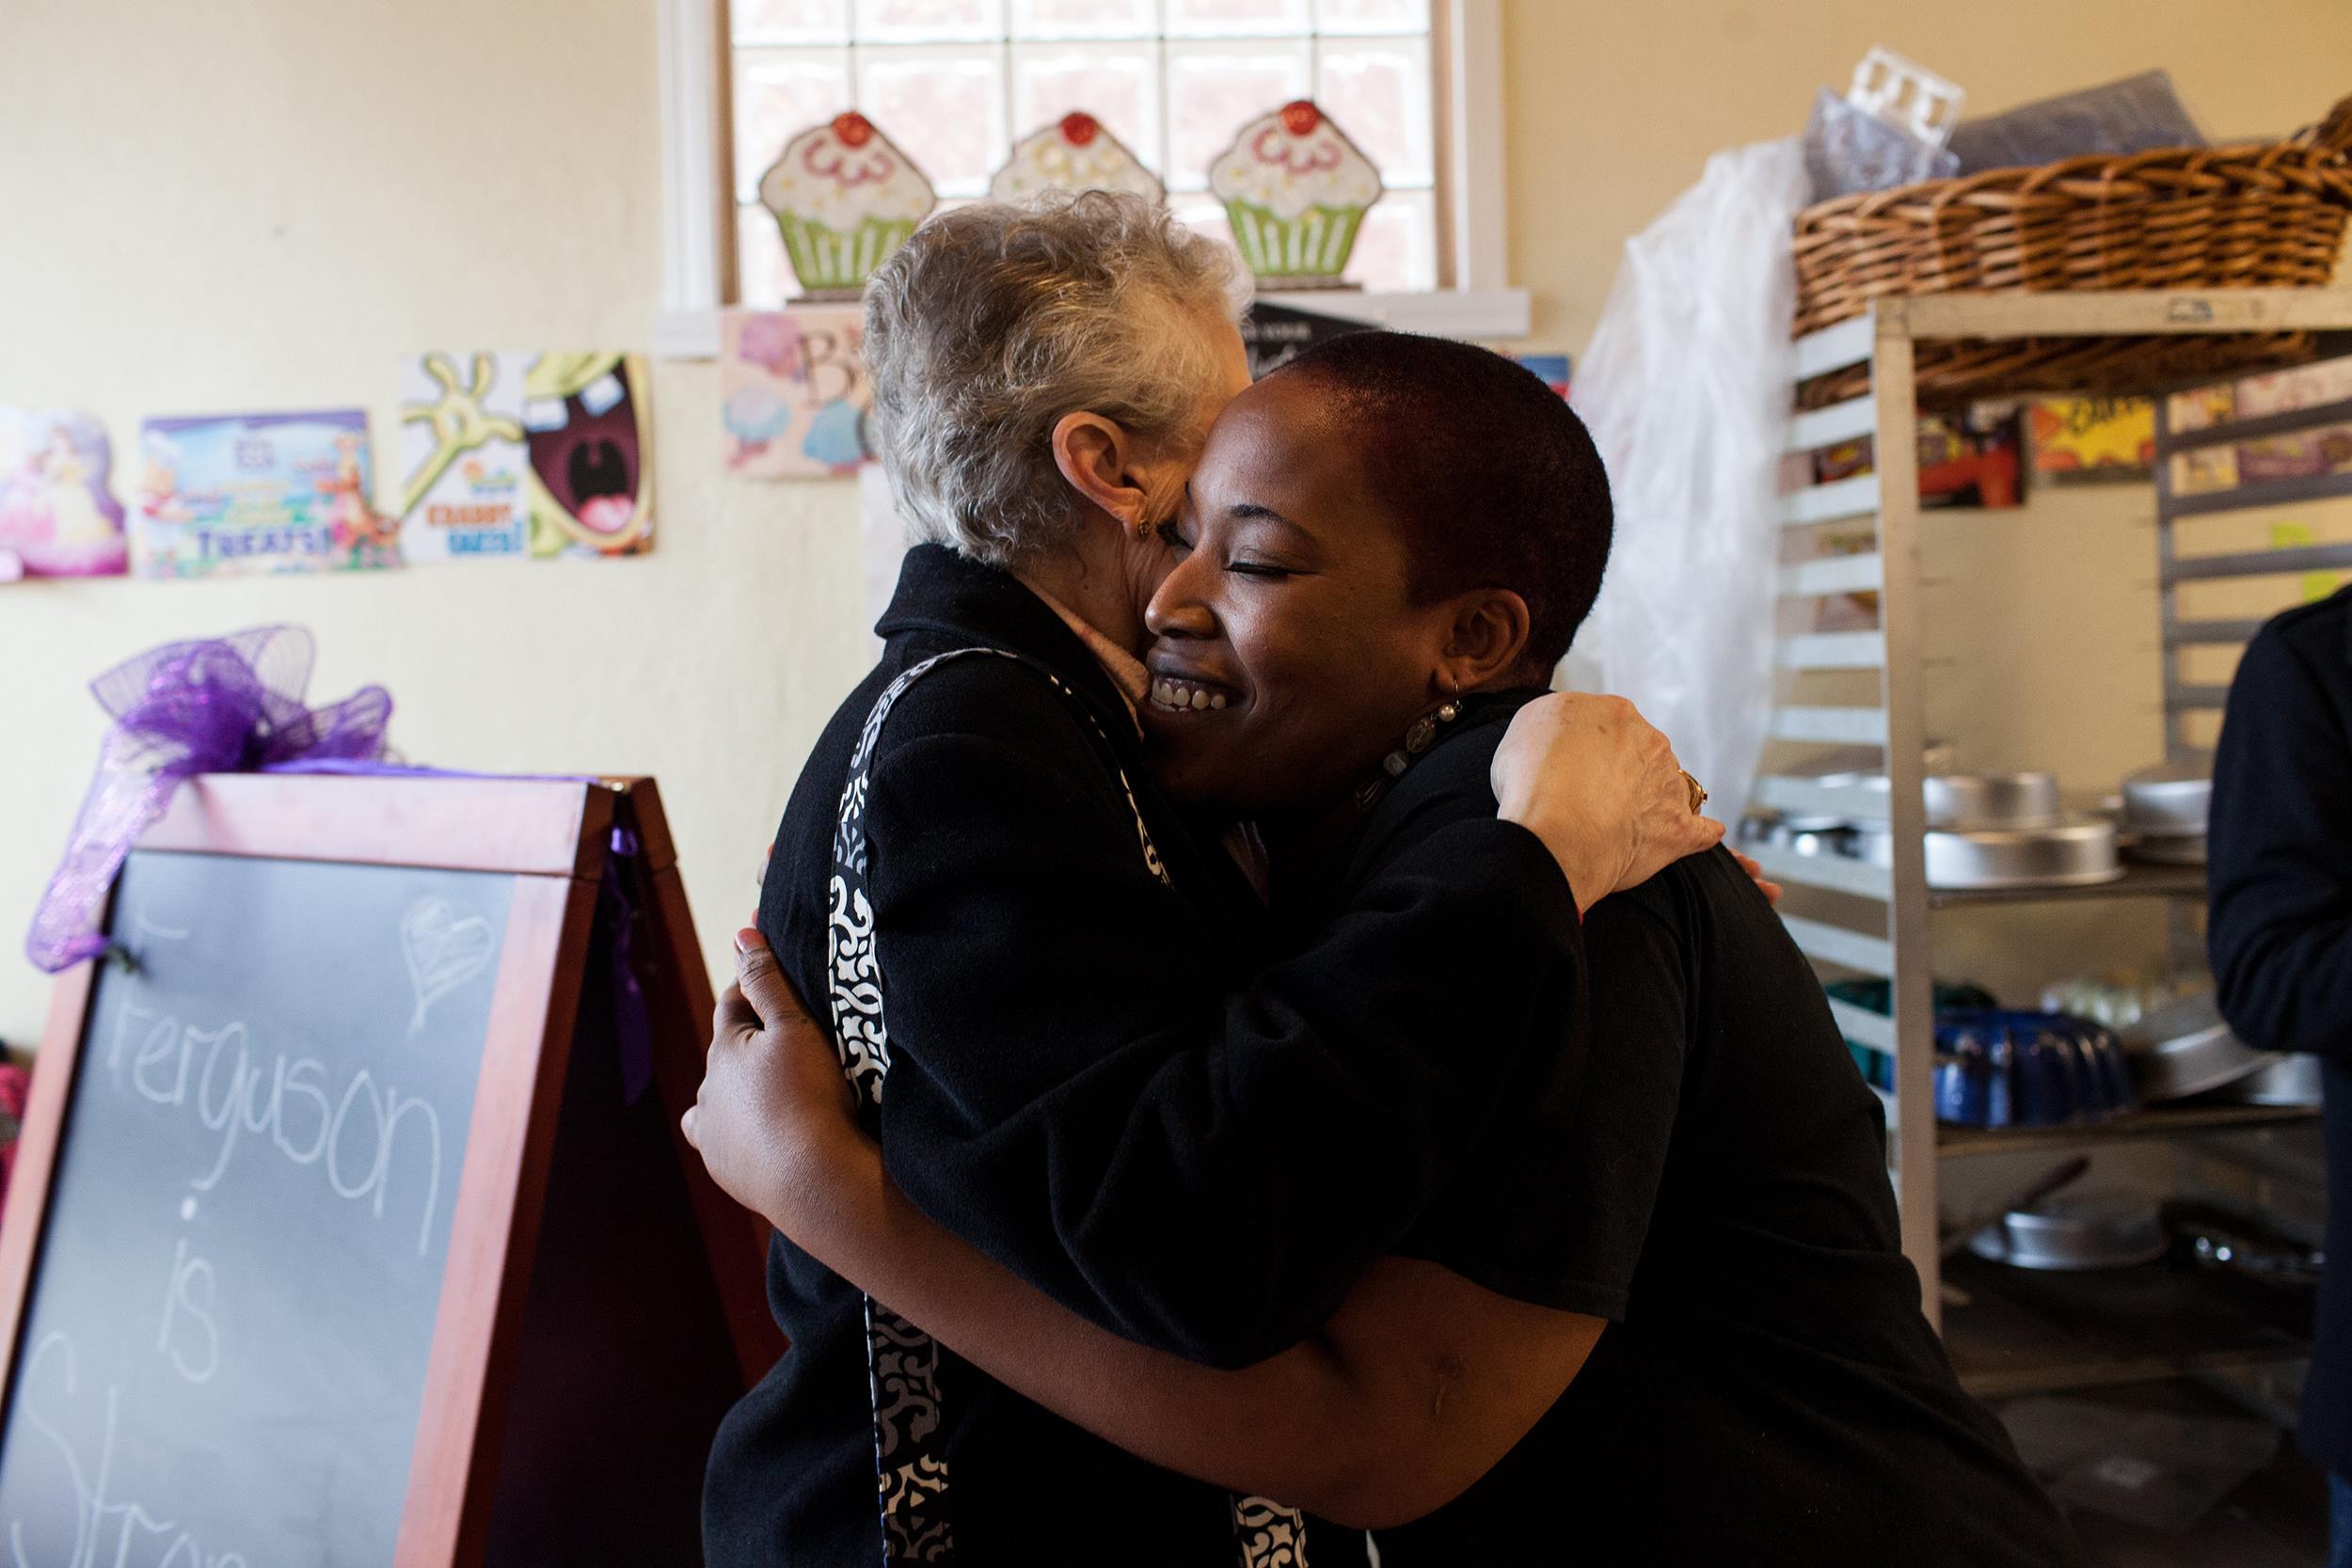 Natalie DuBose:Cakes & More [A Story of Ferguson]